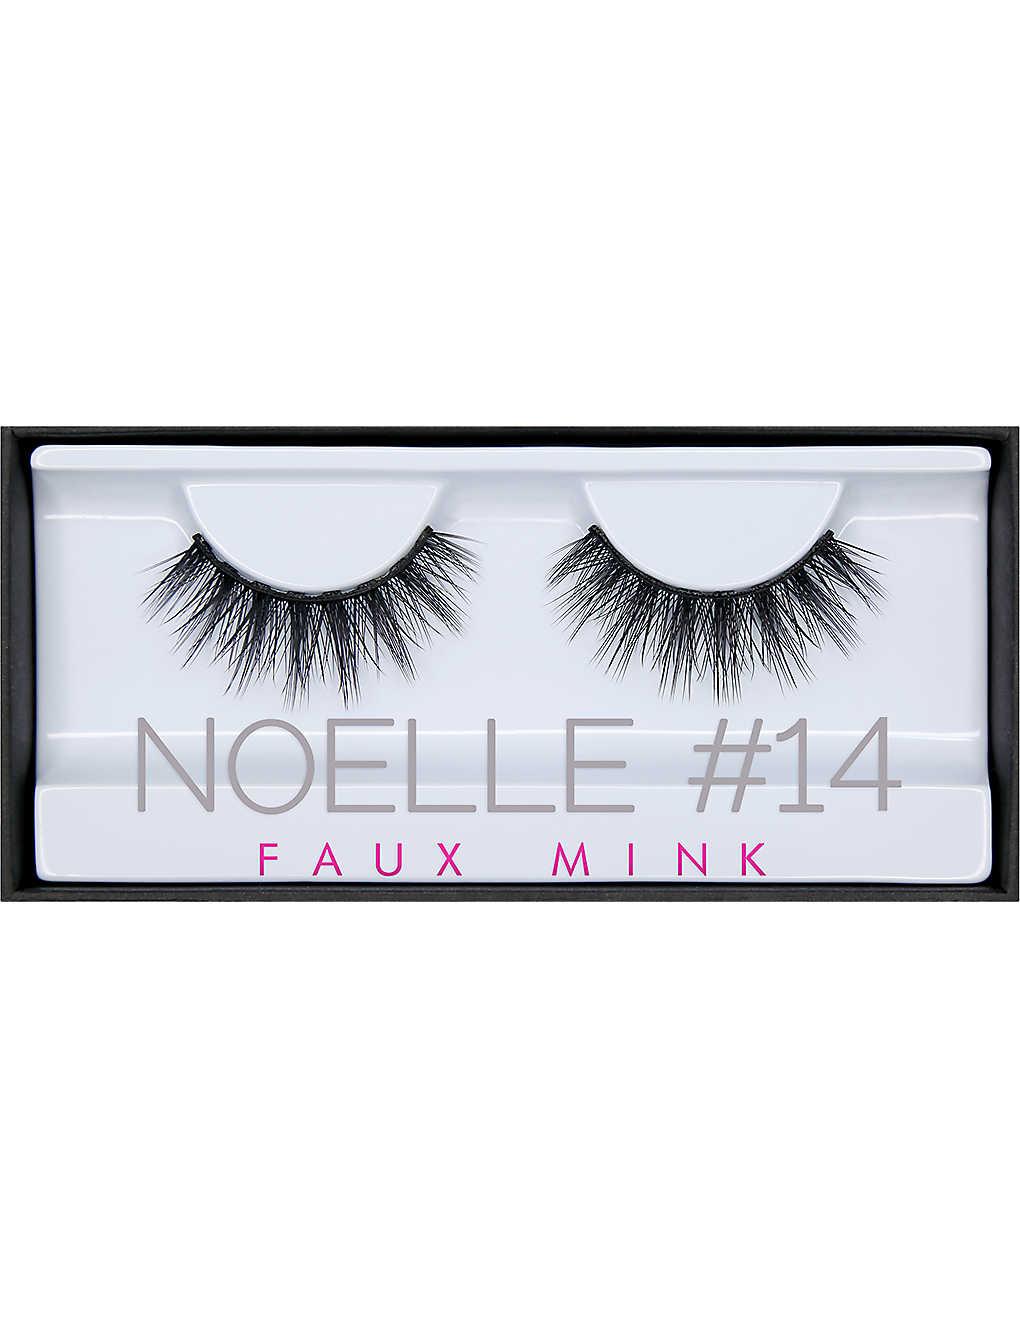 35782c23fb0 HUDA BEAUTY - Noelle Faux Mink lashes #14   Selfridges.com